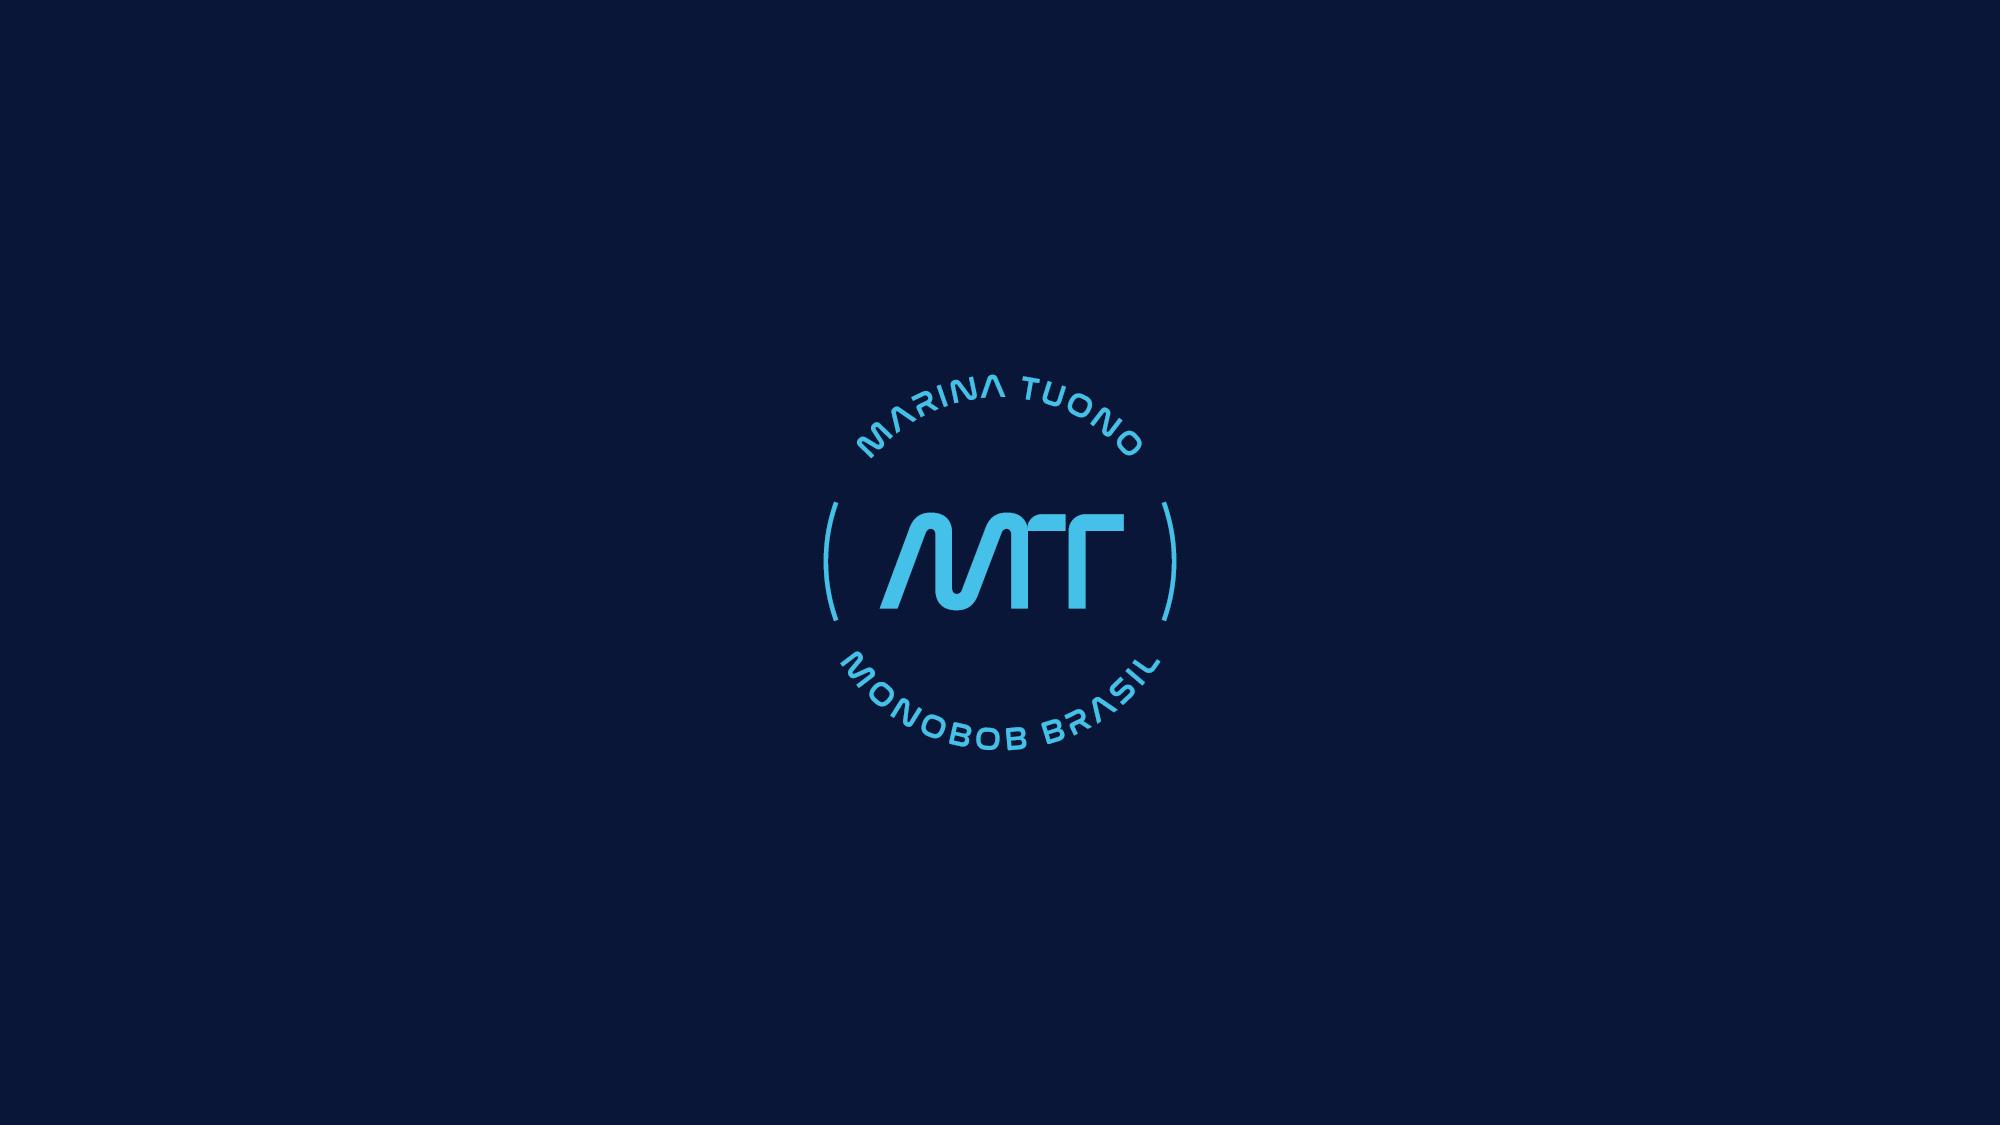 NacioneBranding_MarinaTuono_Monobob4